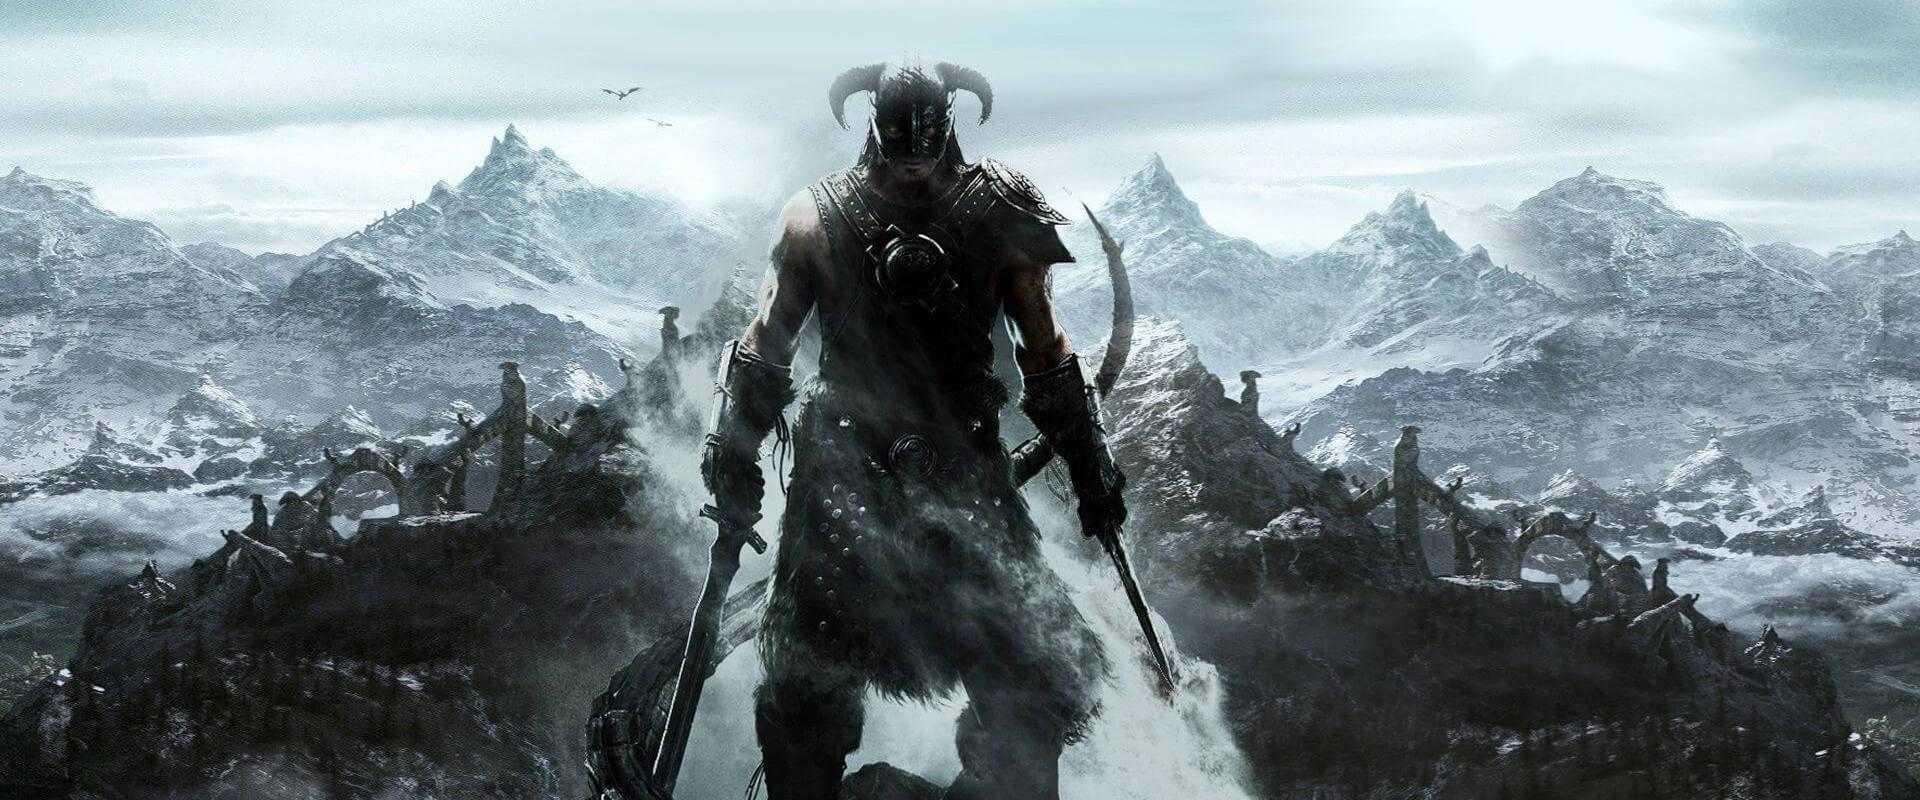 Buy The Elder Scrolls V: Skyrim (Legendary Edition) Steam Key GLOBAL | ENEBA